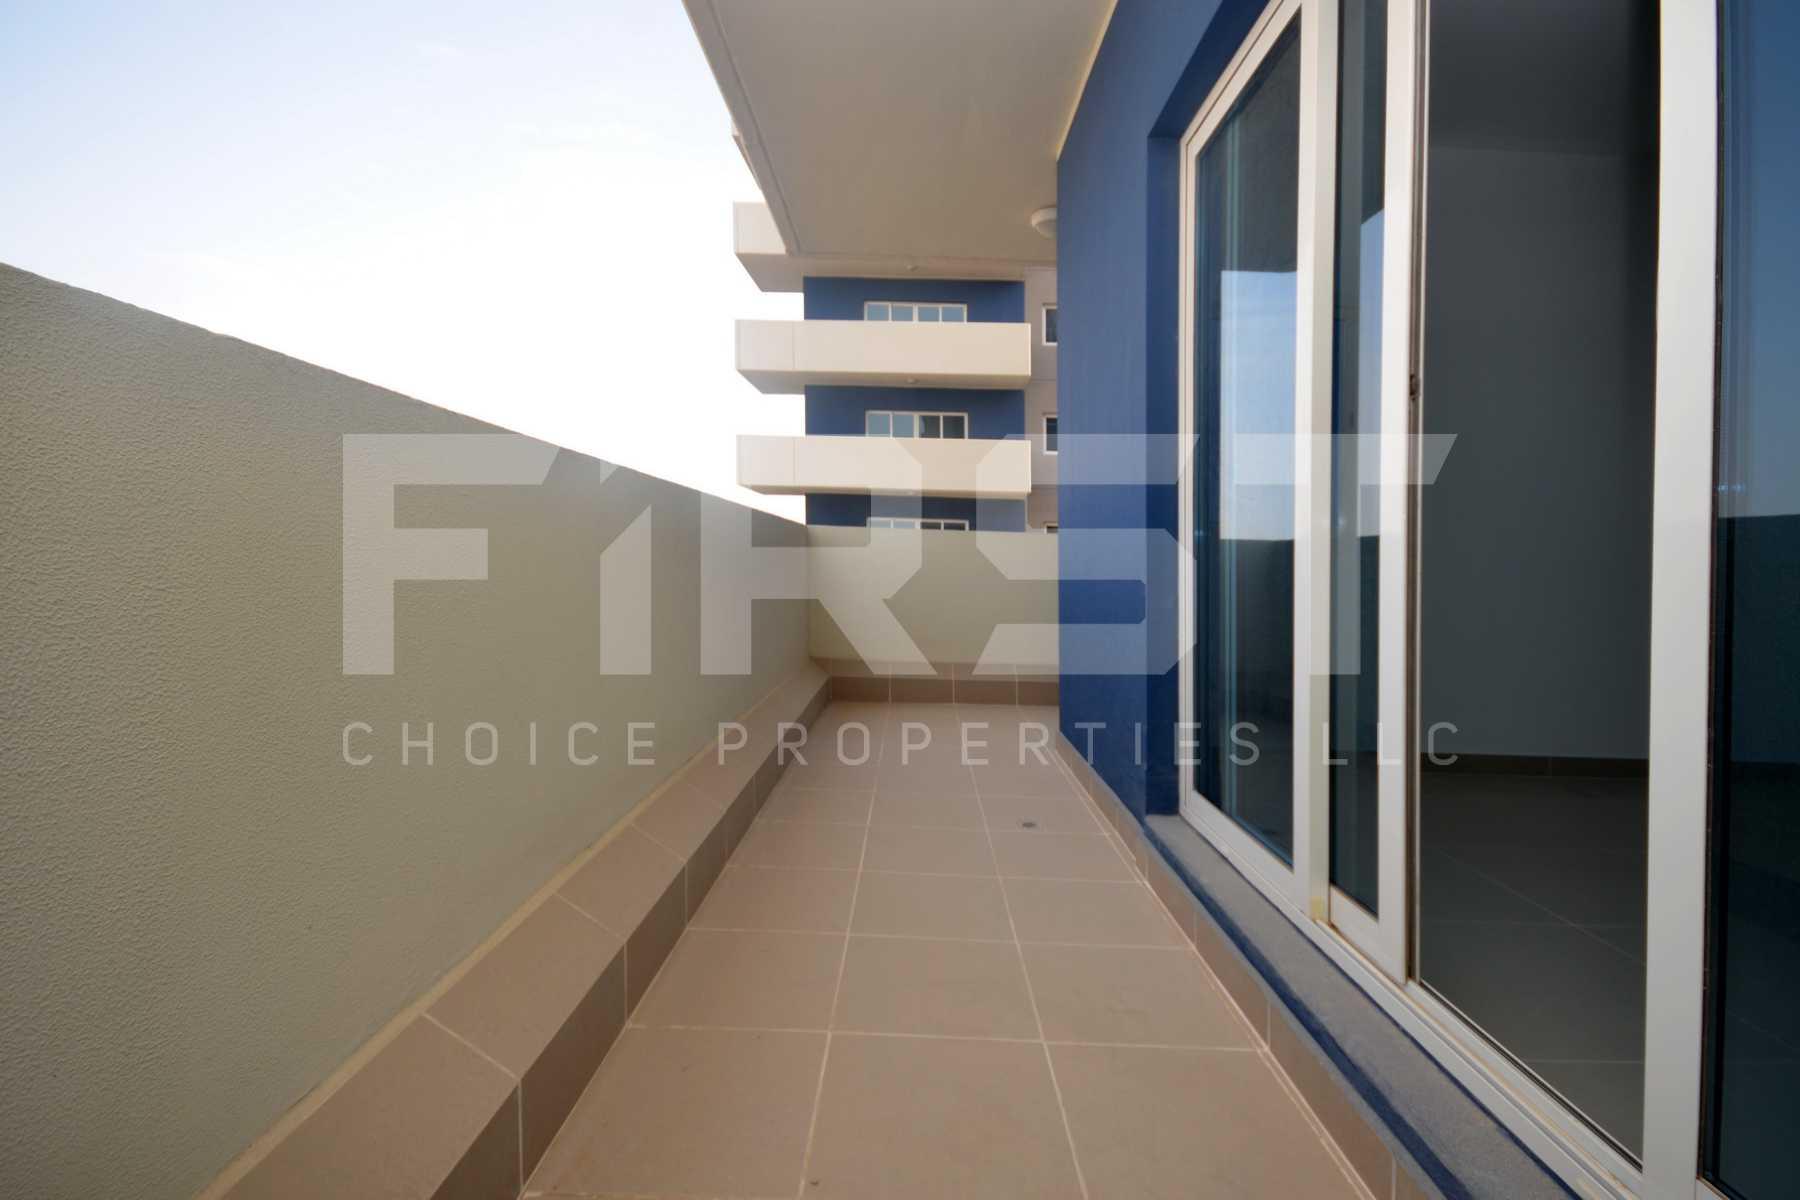 Internal Photo of 3 Bedroom Apartment Type D Open Kitchen in Al Reef Downtown Al Reef Abu Dhabi UAE 145sq.m 1560 sq.ft (19).jpg